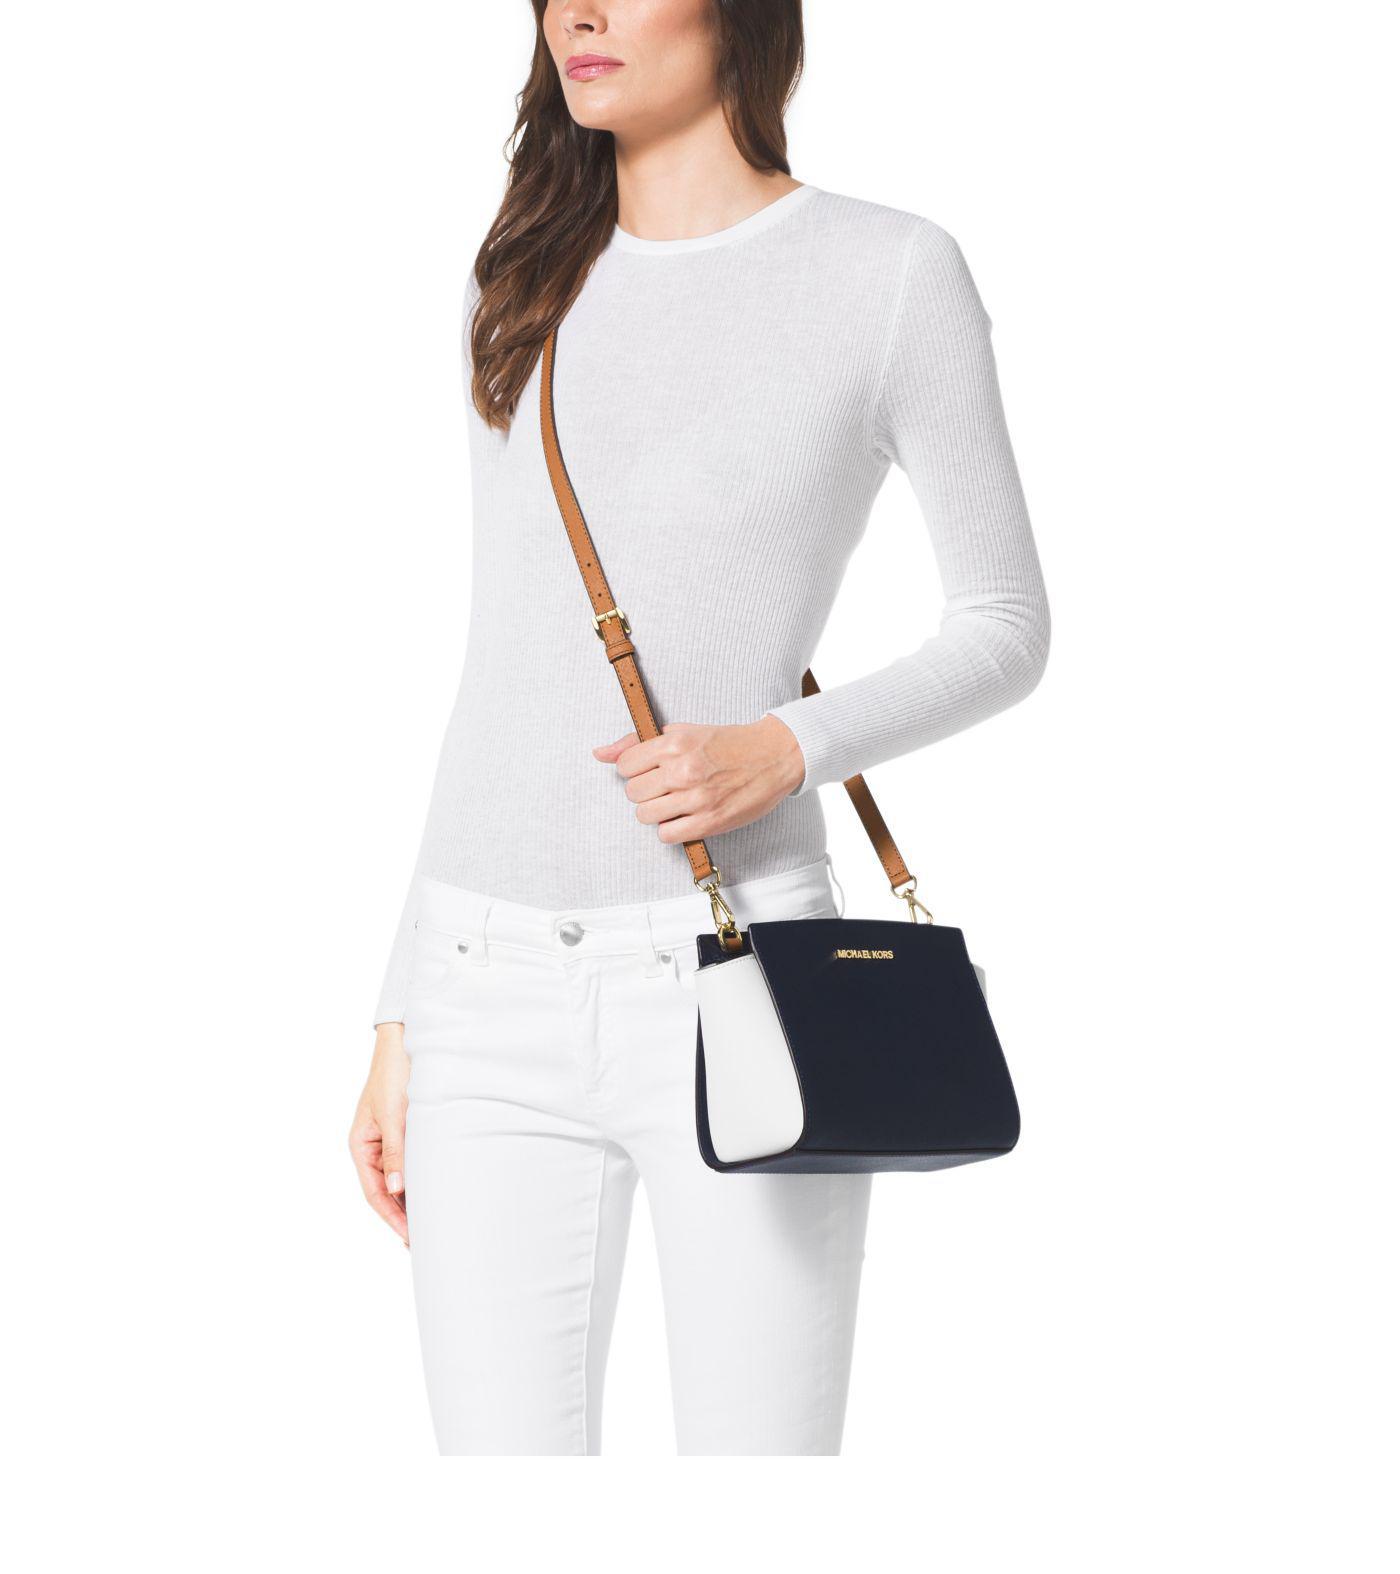 d72629ef133e5 Michael Kors Selma Medium Color-block Leather Crossbody Bag in Blue ...